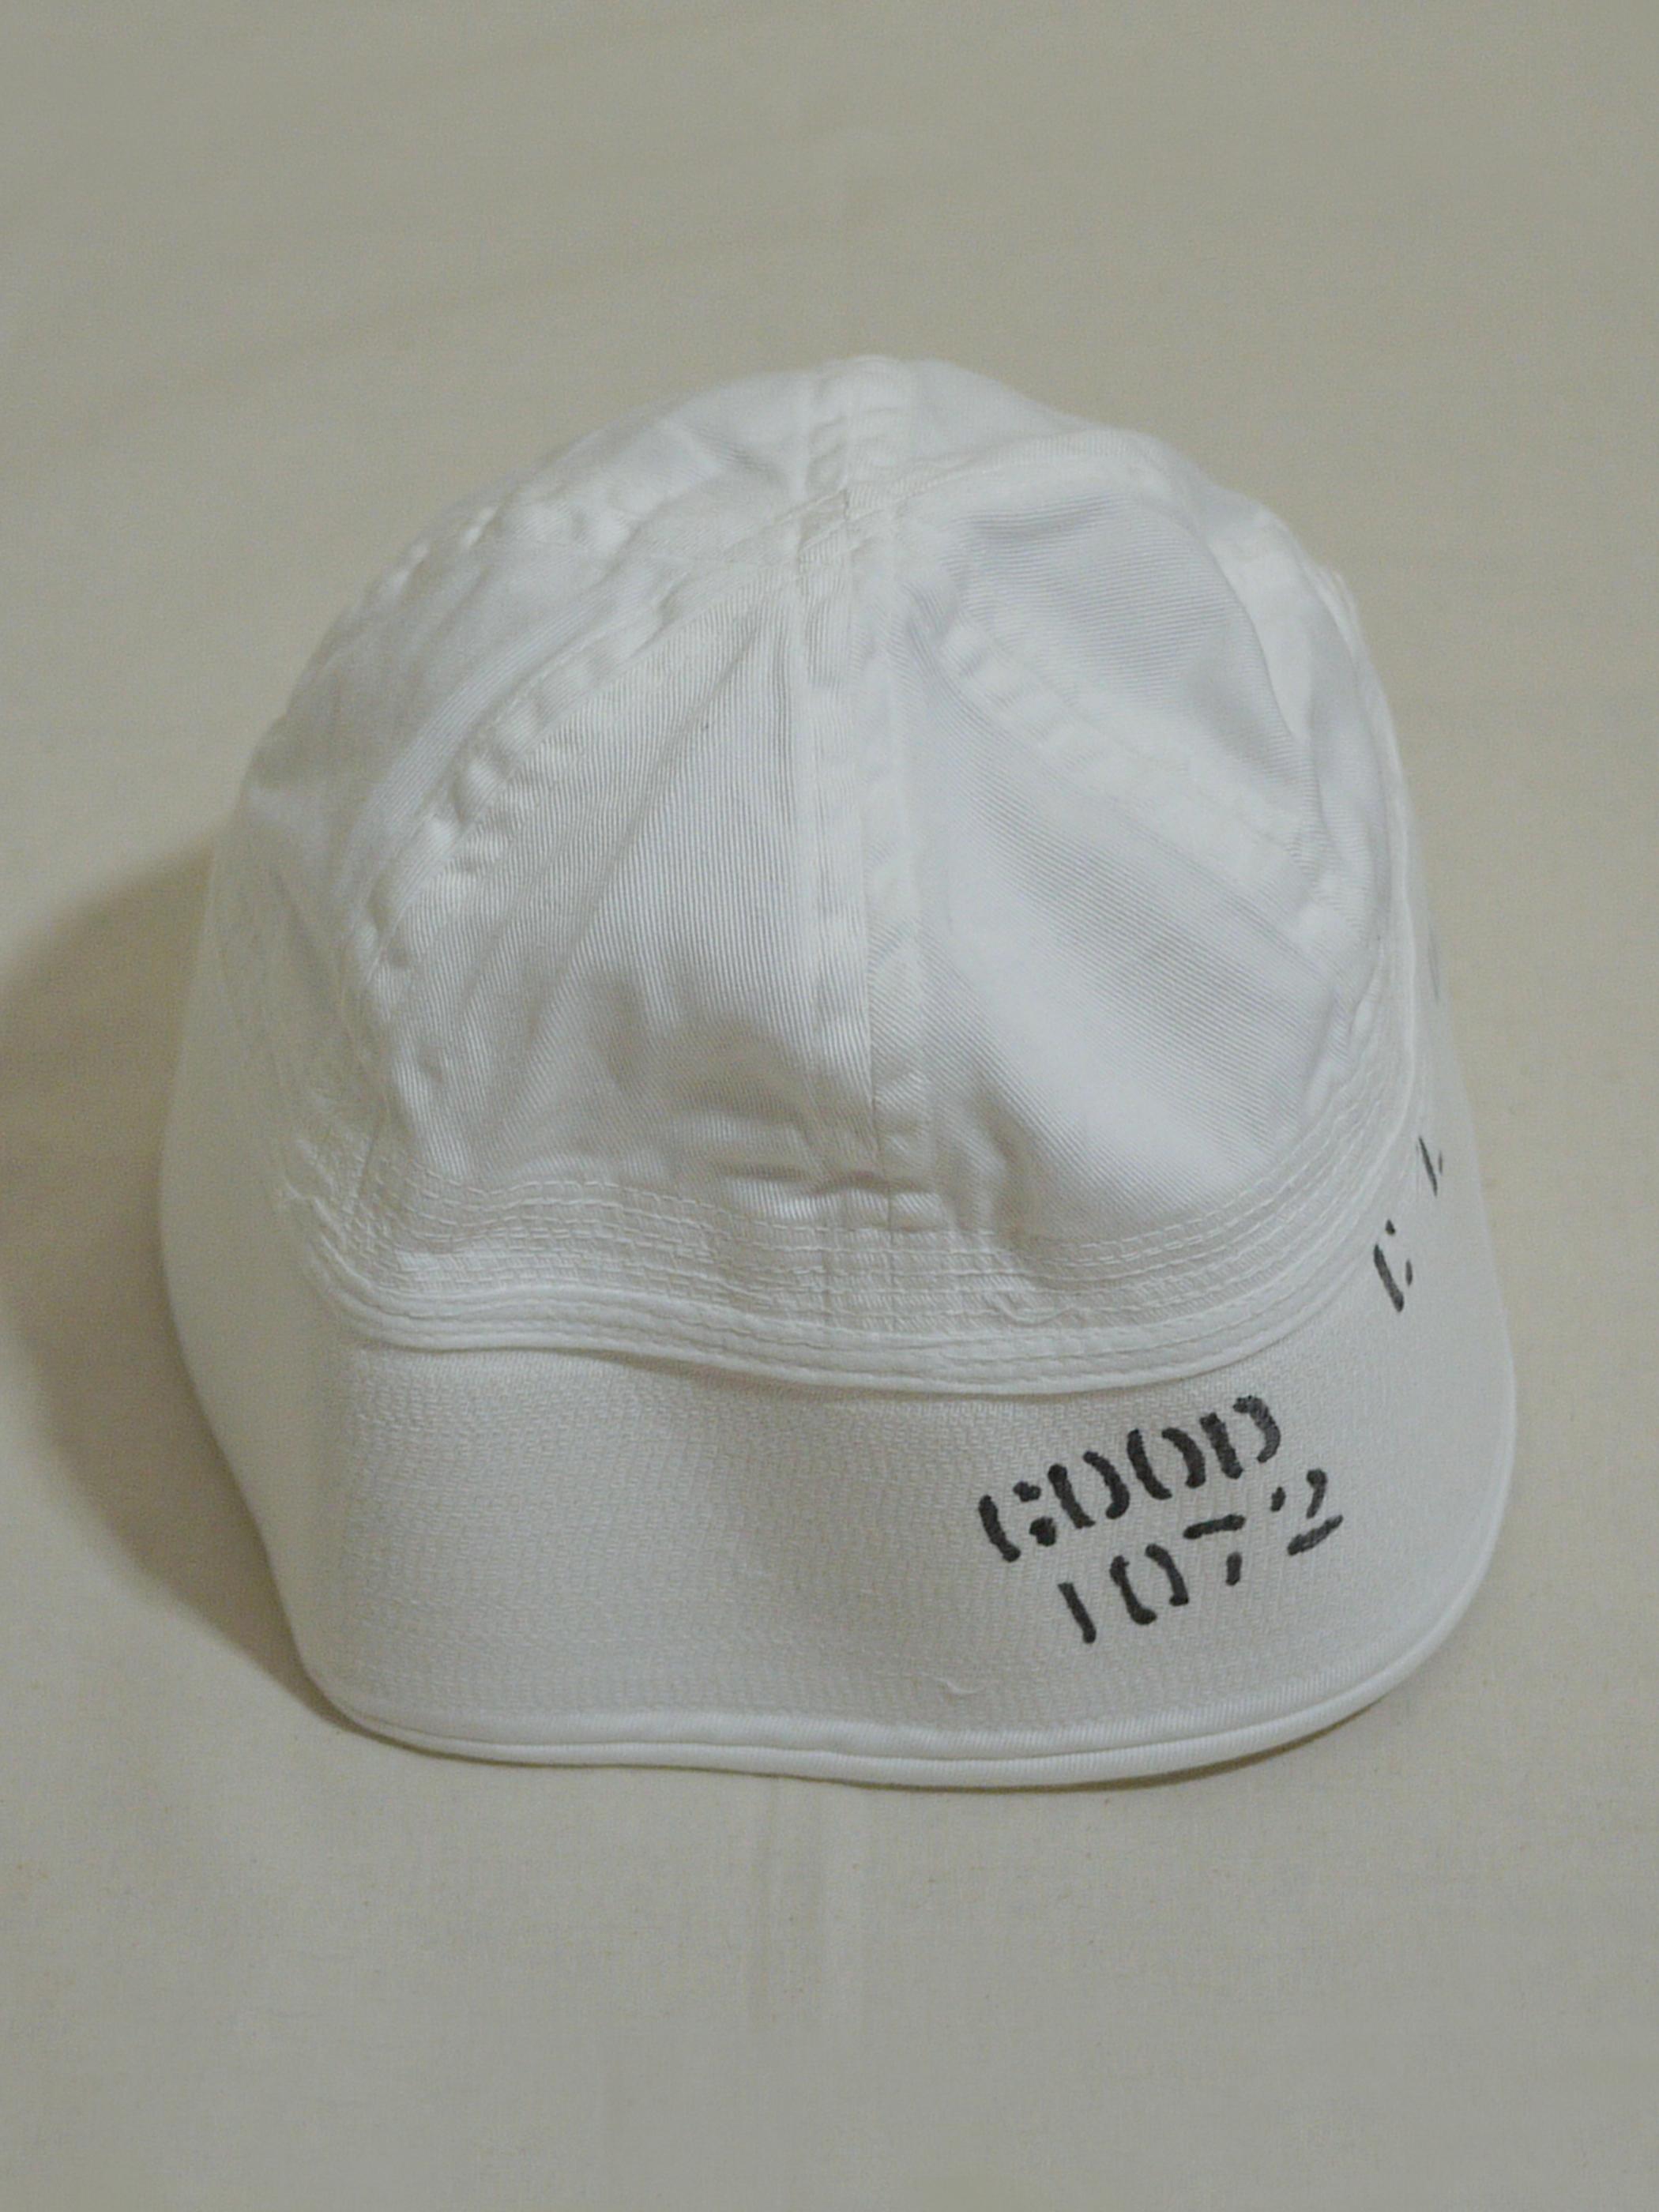 U.S.NAVY 1990's Sailor hat Size7 1/4 #1